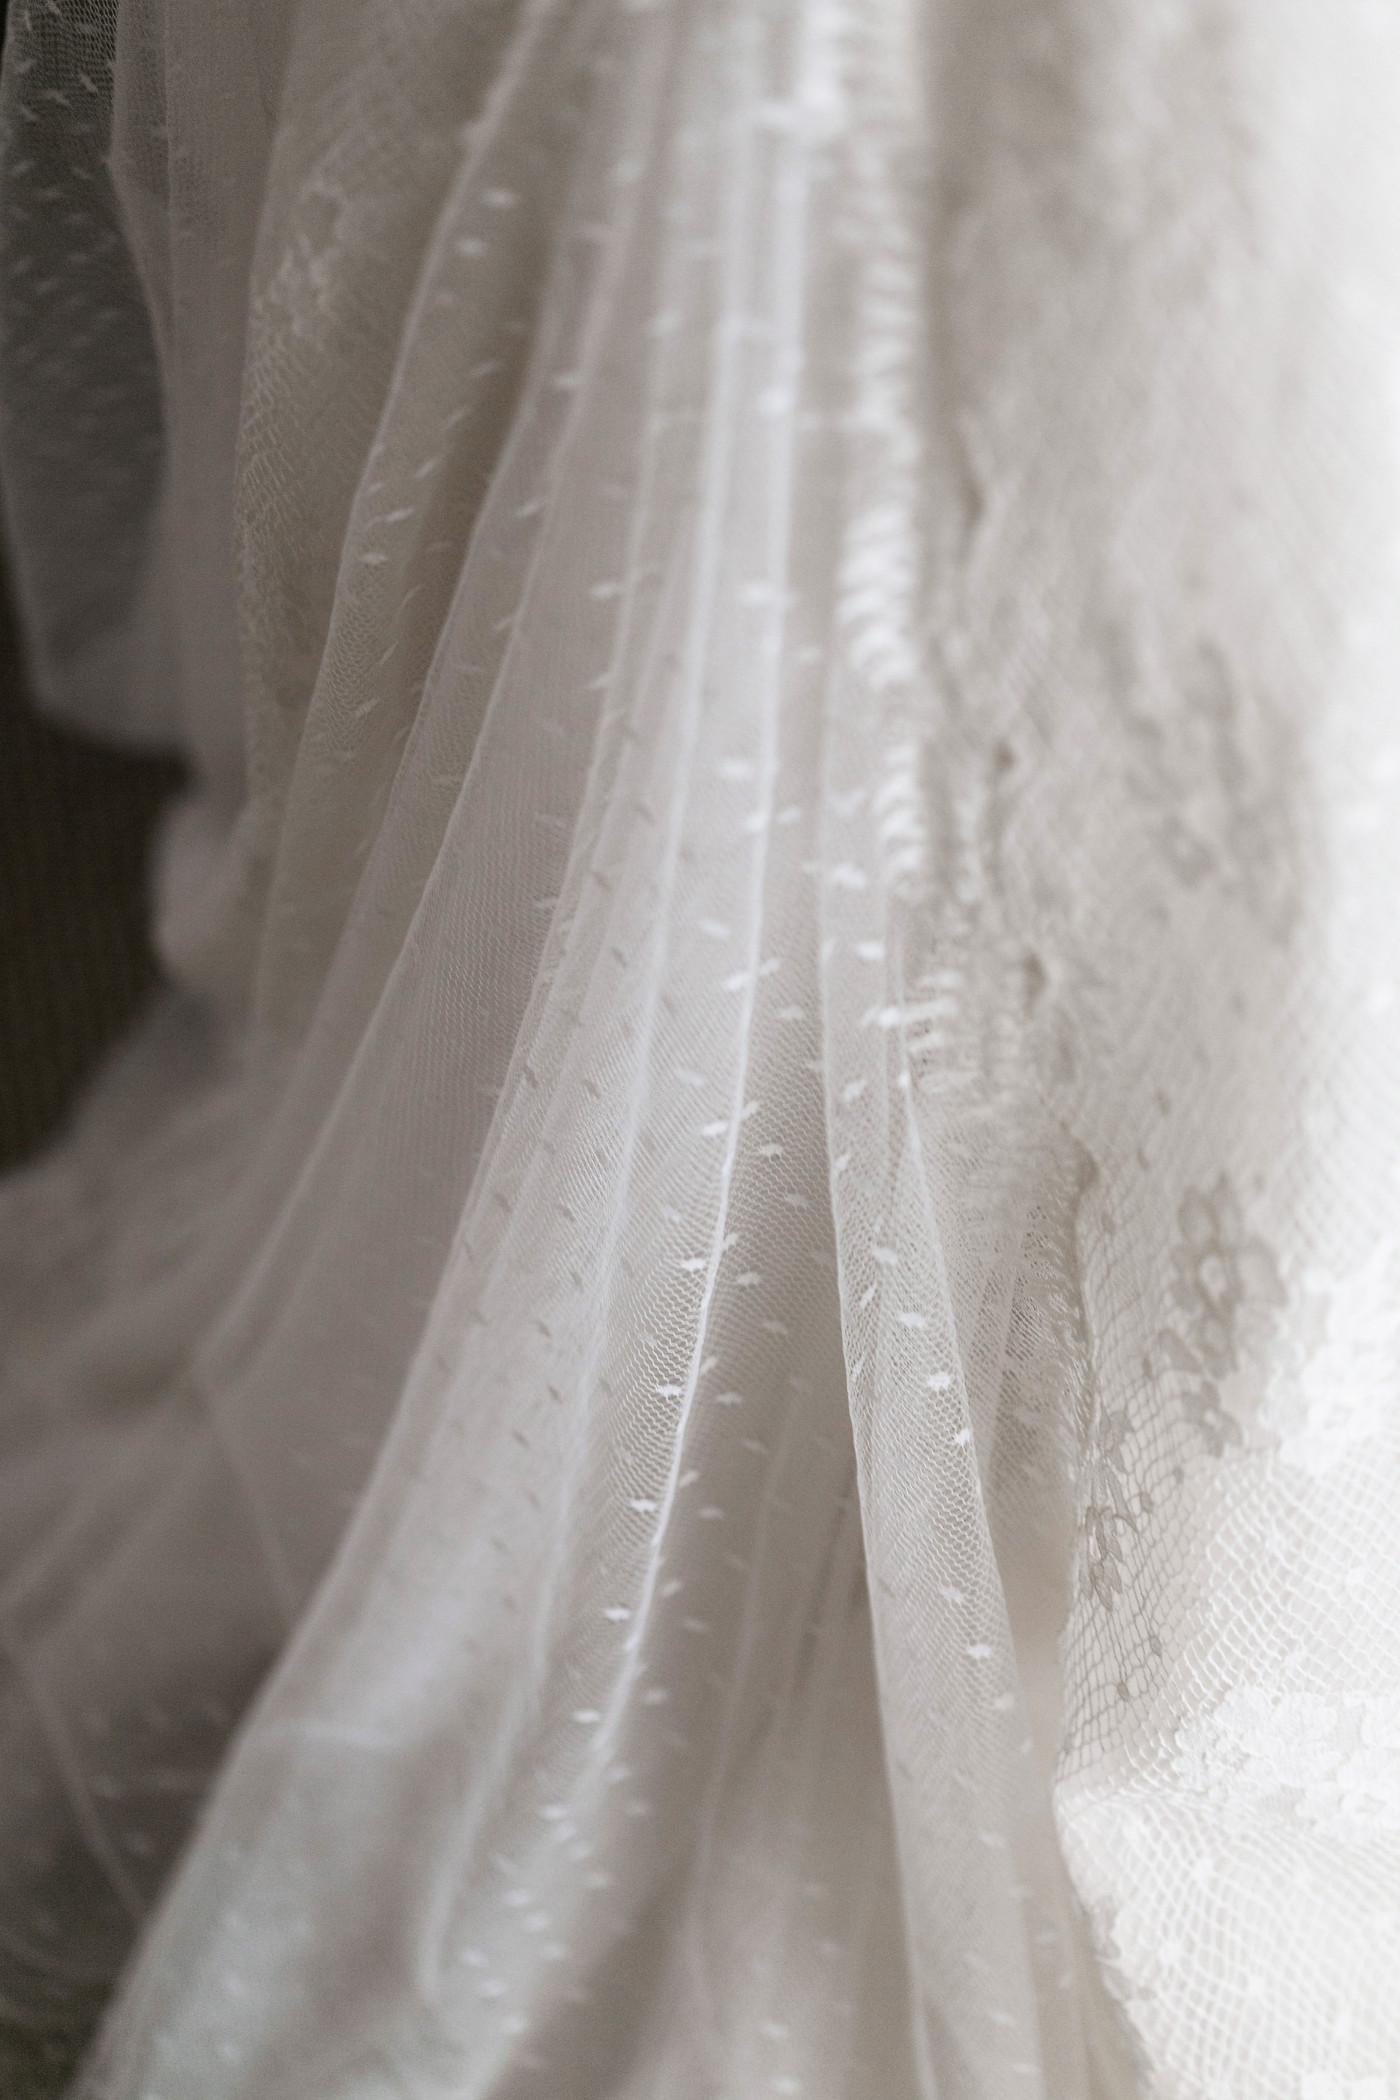 View More: http://kandkphotography.pass.us/natalie-bertrand-wedding